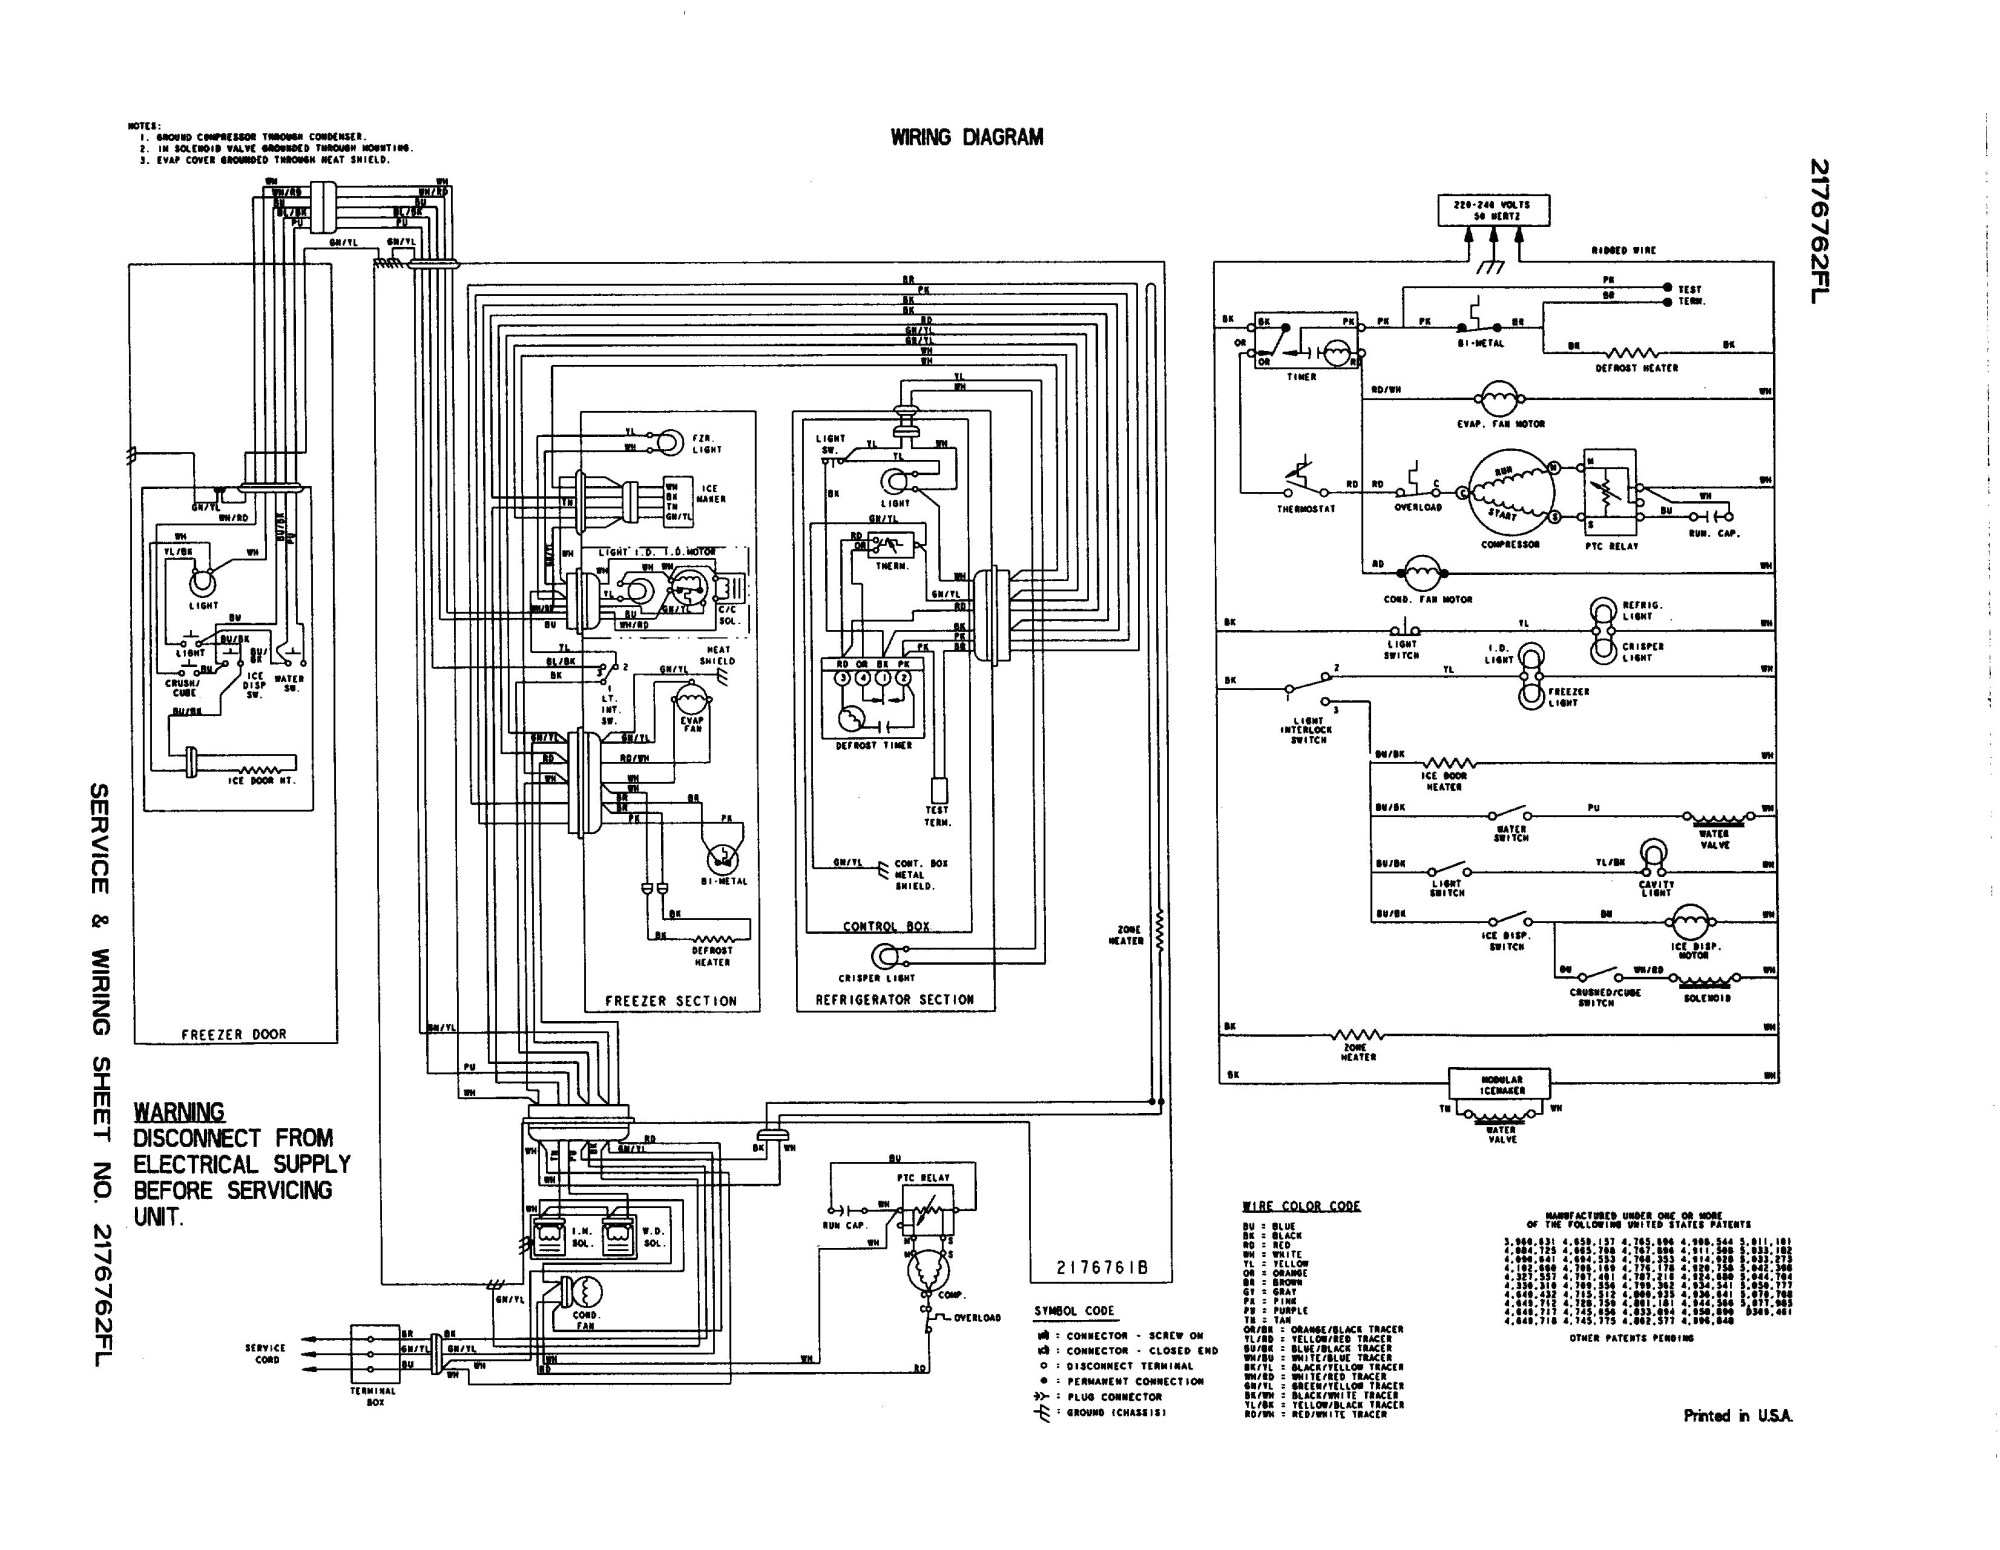 hight resolution of whirlpool refrigerator wiring diagram